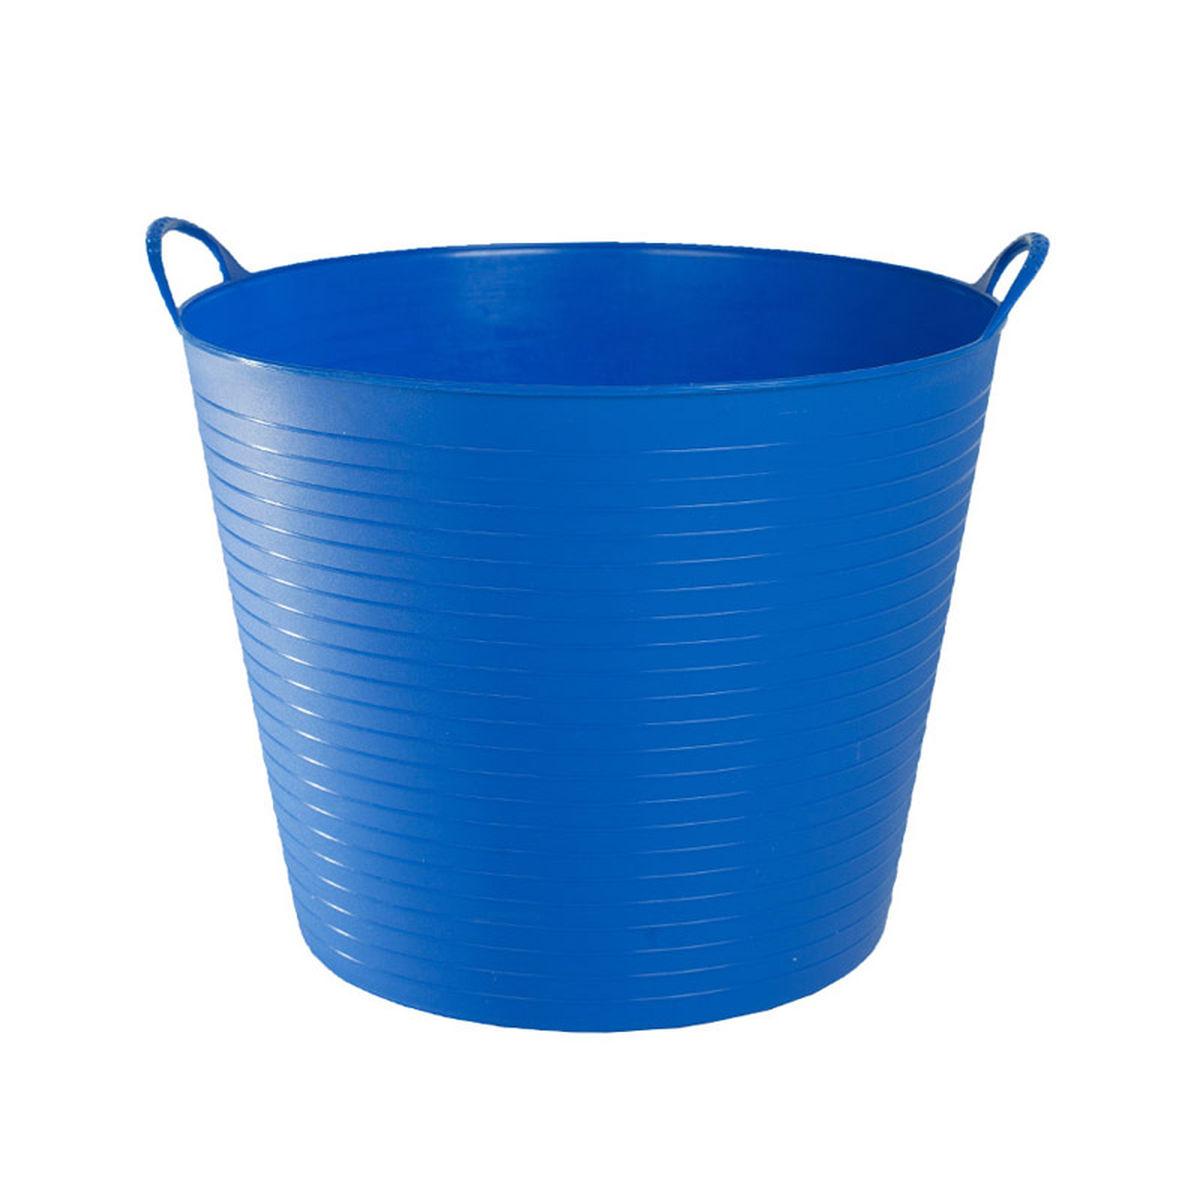 az reitsport horze zofty eimer flexibel 30 liter blau. Black Bedroom Furniture Sets. Home Design Ideas